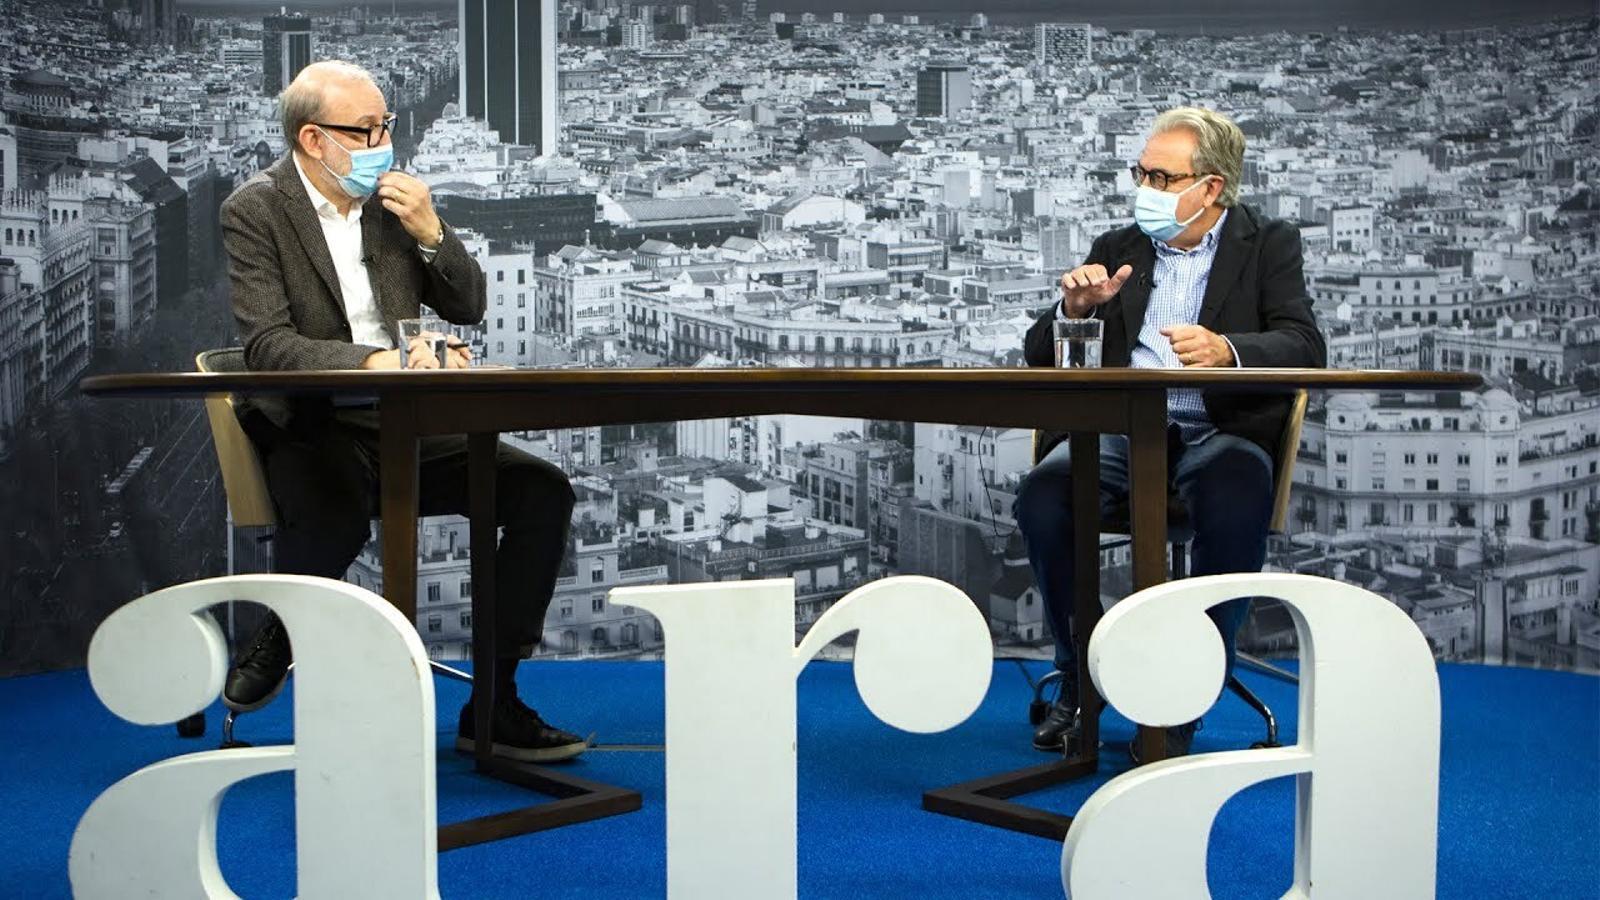 Entrevista d'Antoni Bassas a Antoni Batista